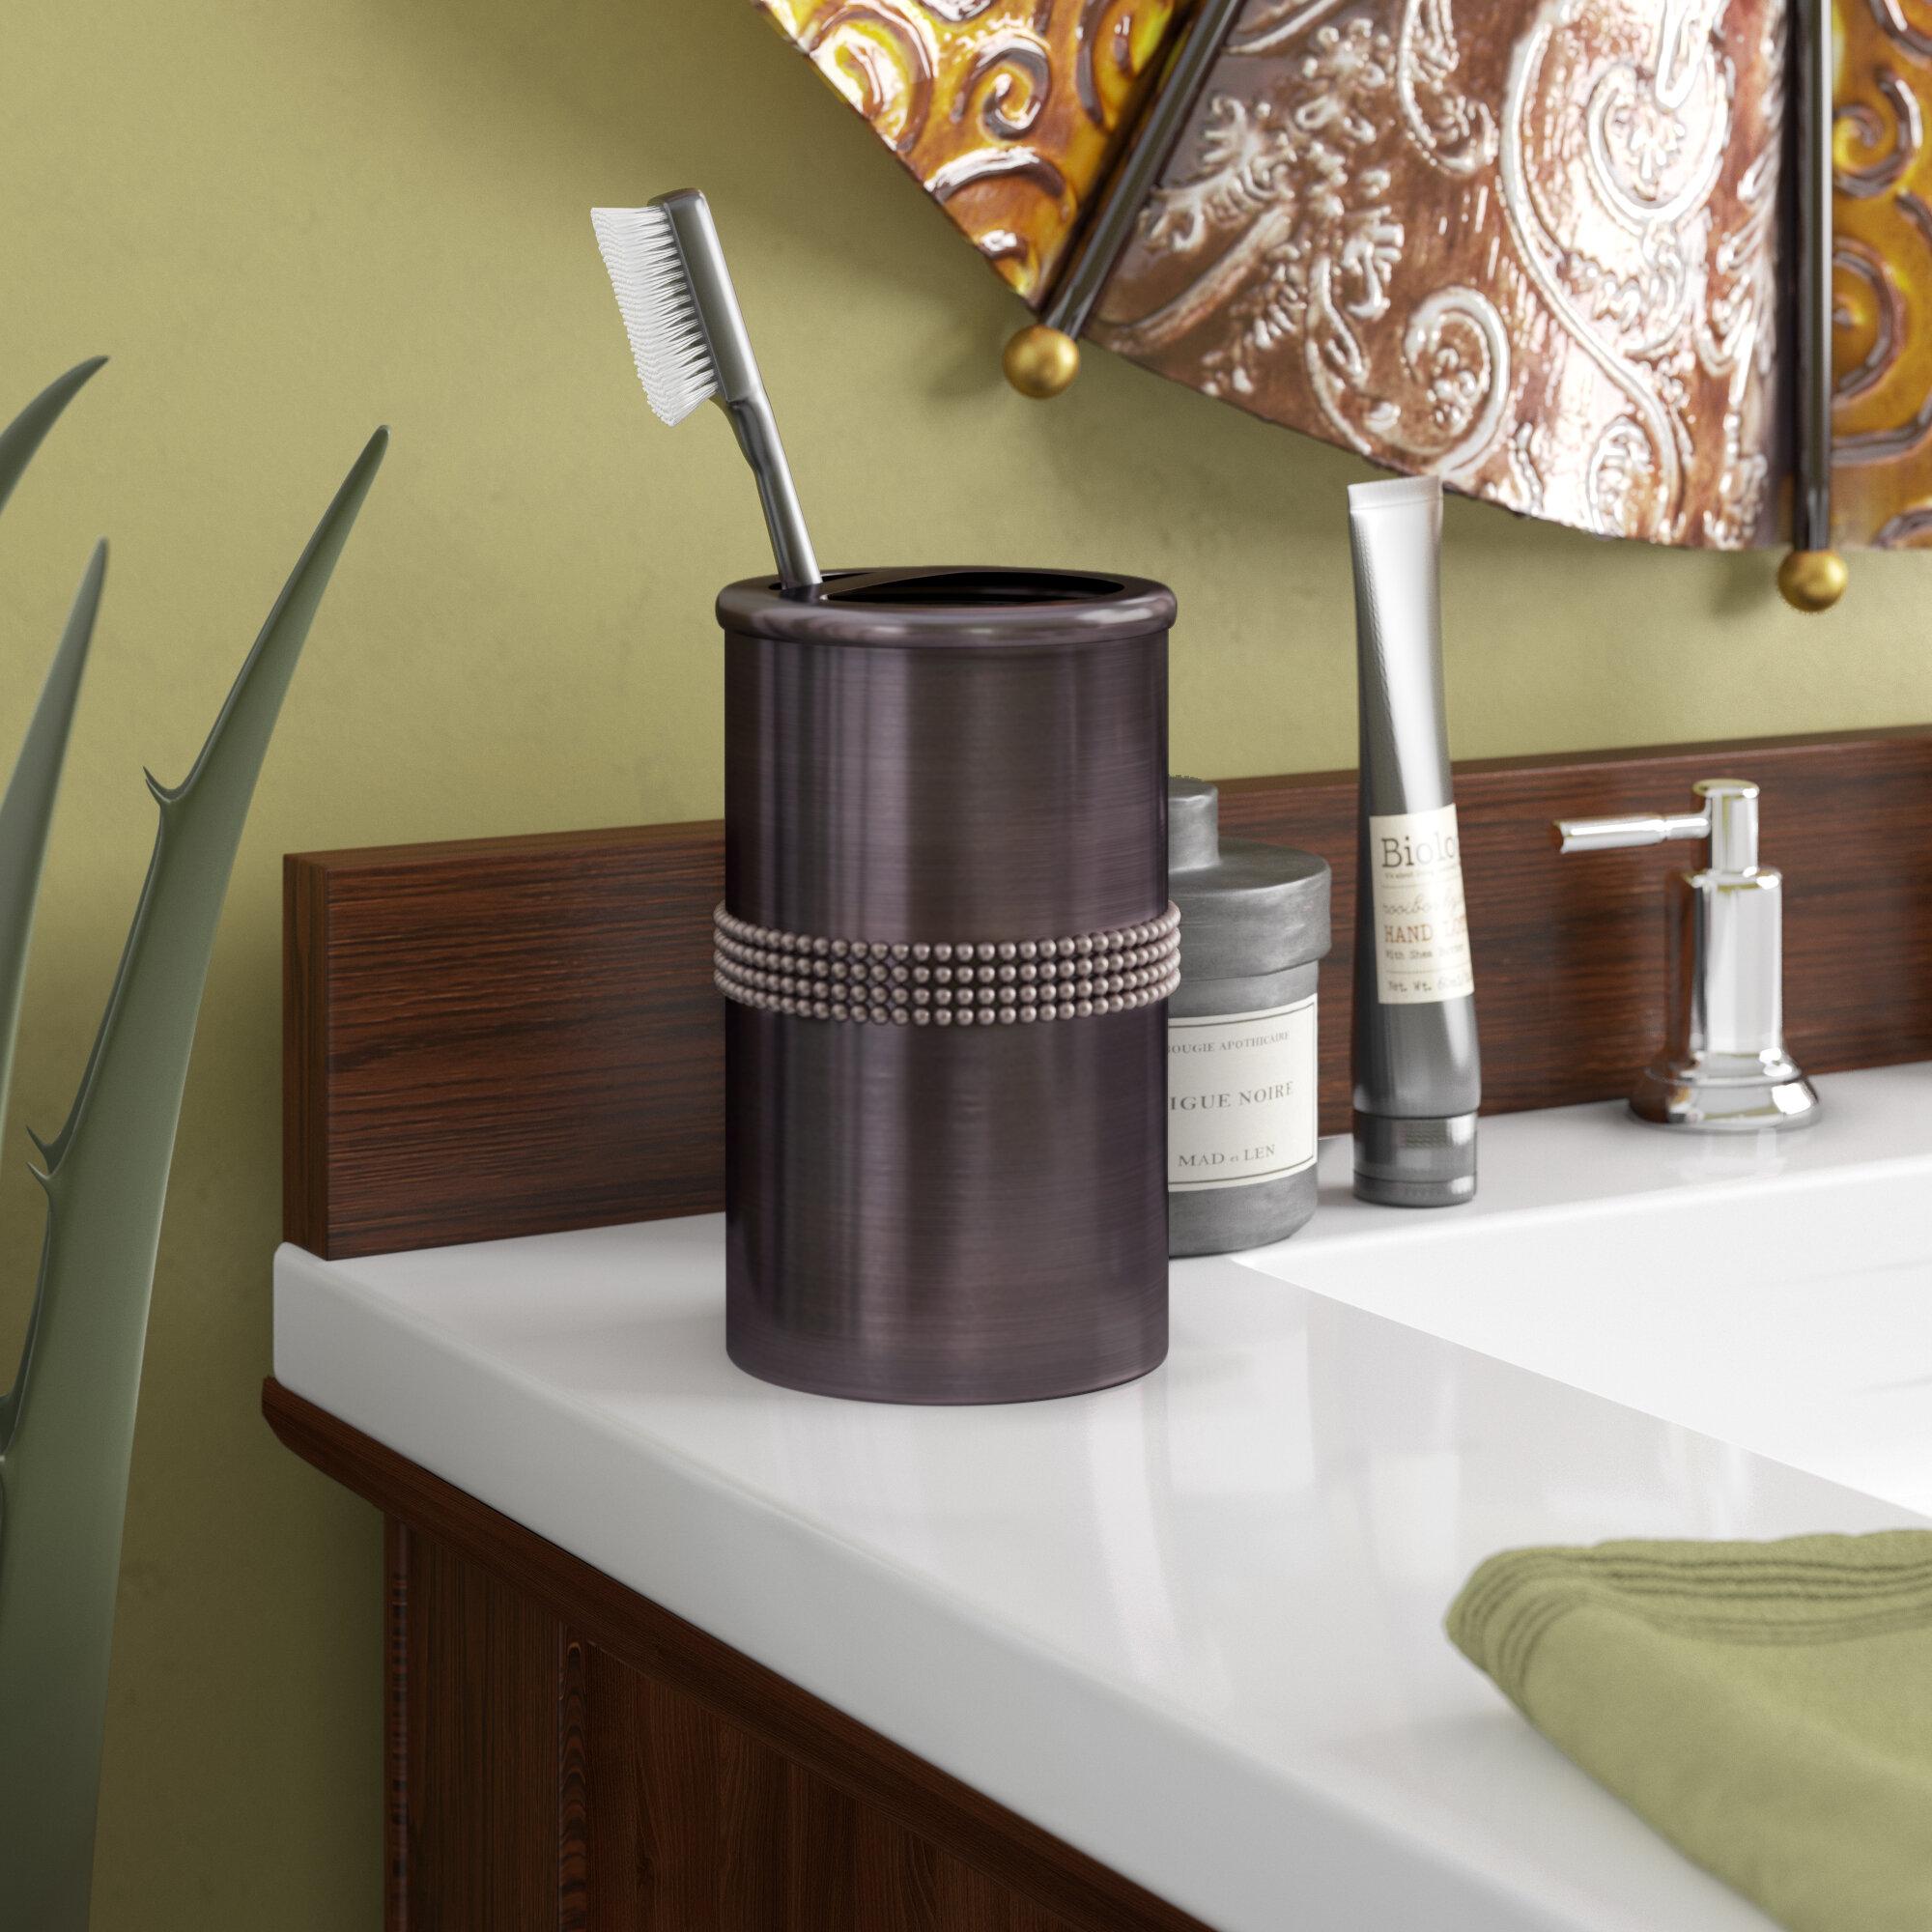 Oil Rubbed Bronze Toothbrush Holder Bathroom Countertop Stand Storage Organizer